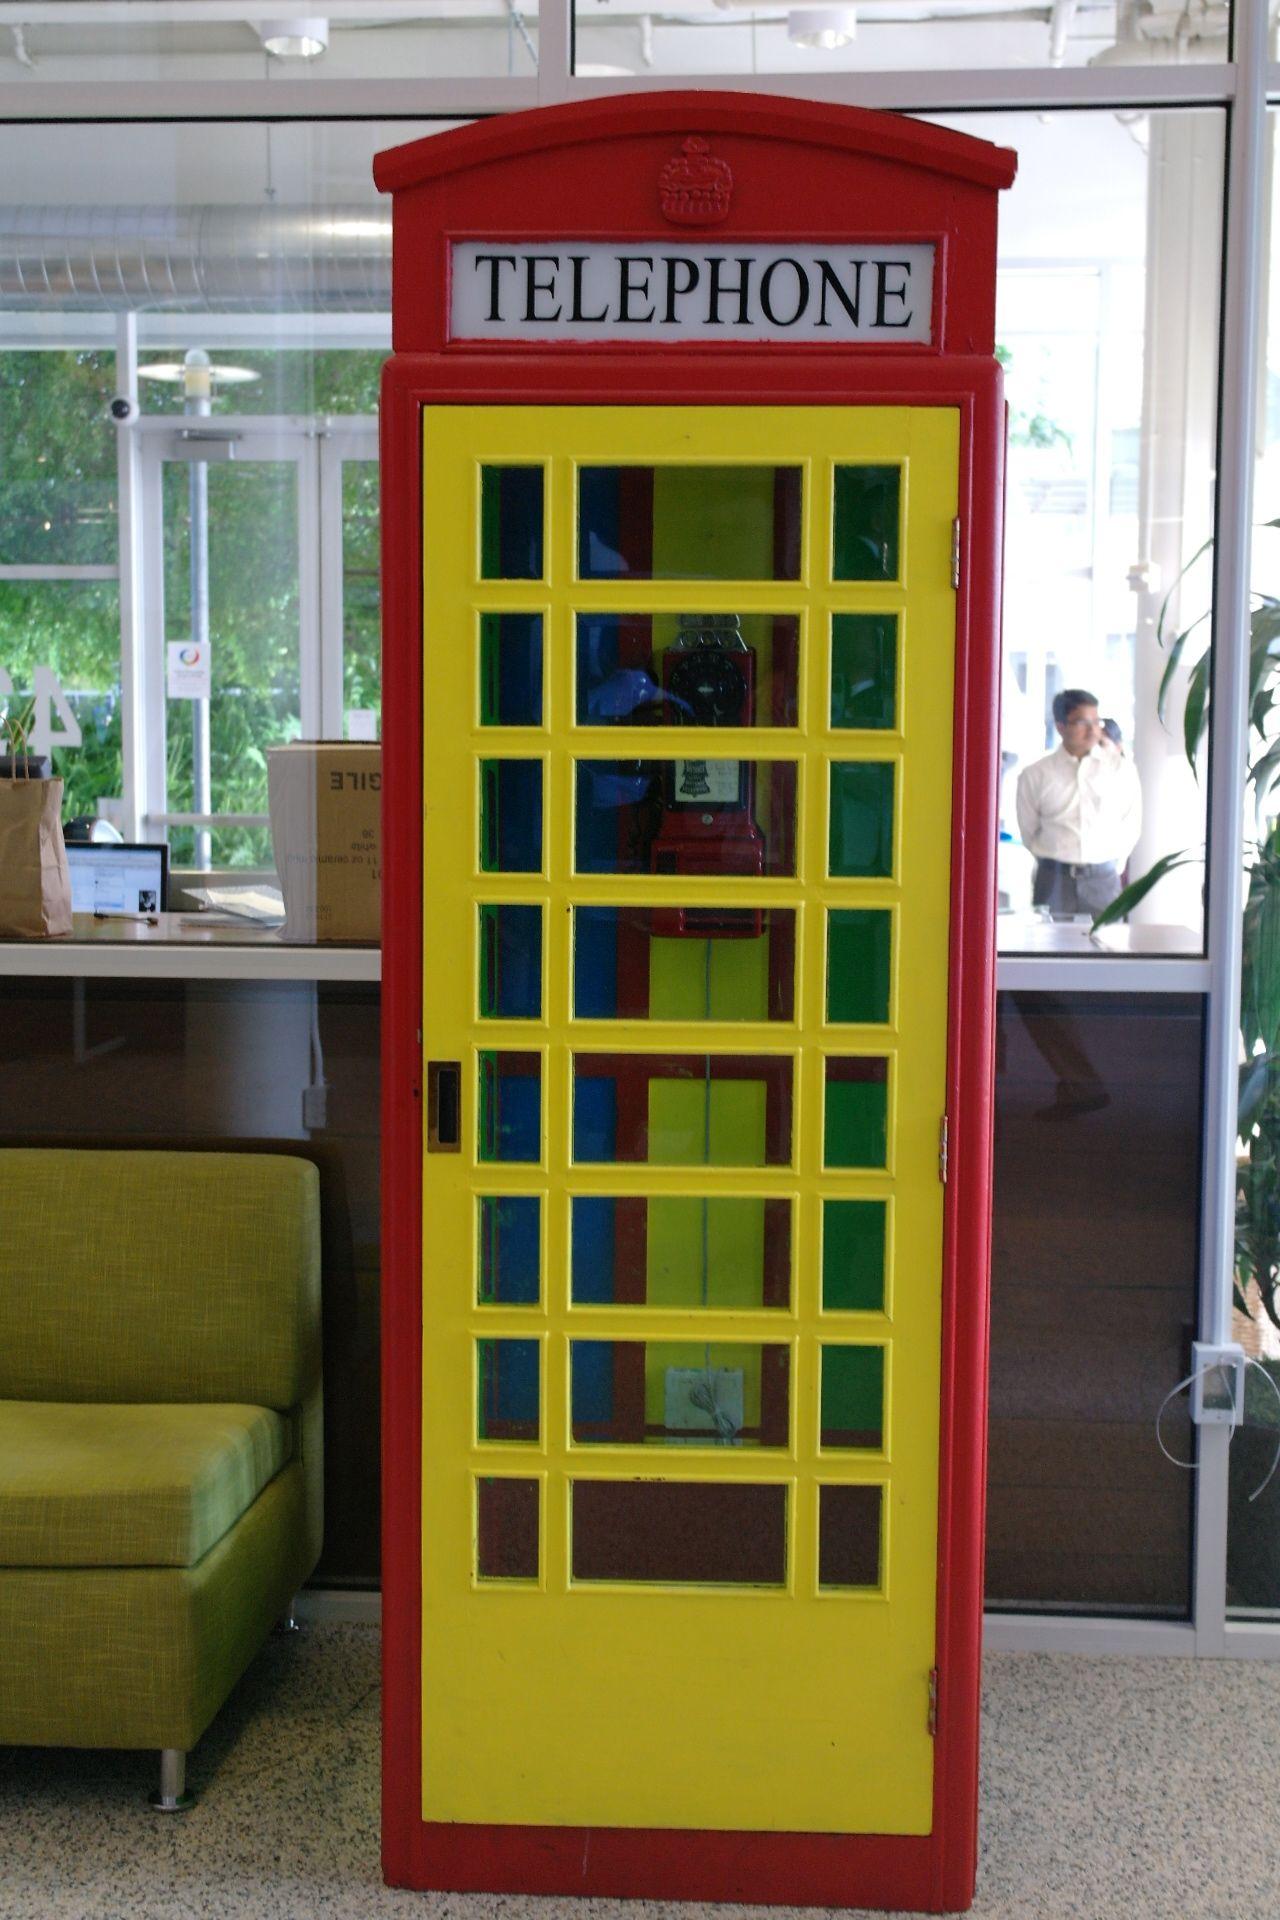 Google Telephone Booth